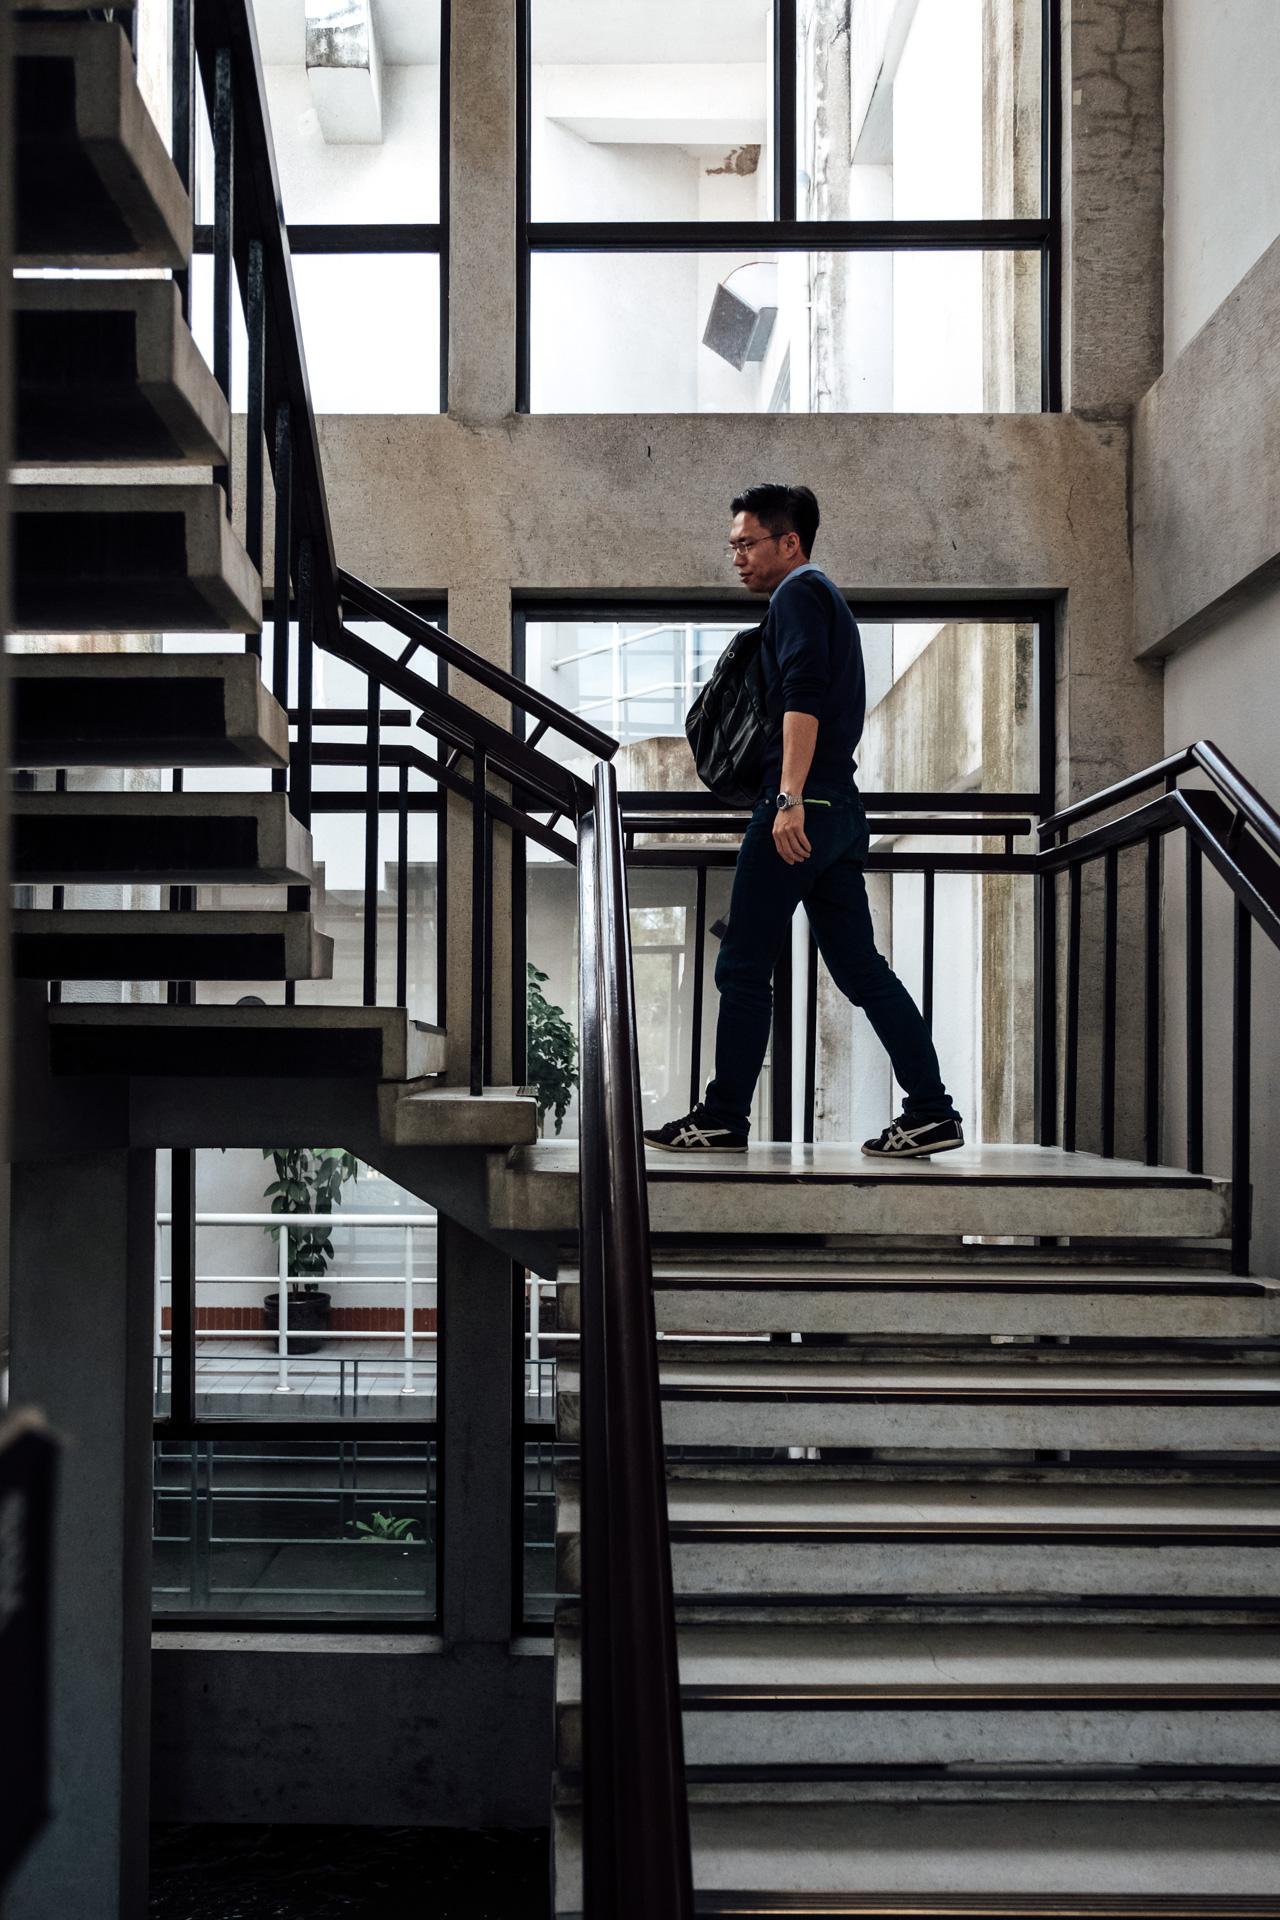 - 鄭成功歷史文物館 – Staircase inside Koxinga Museum